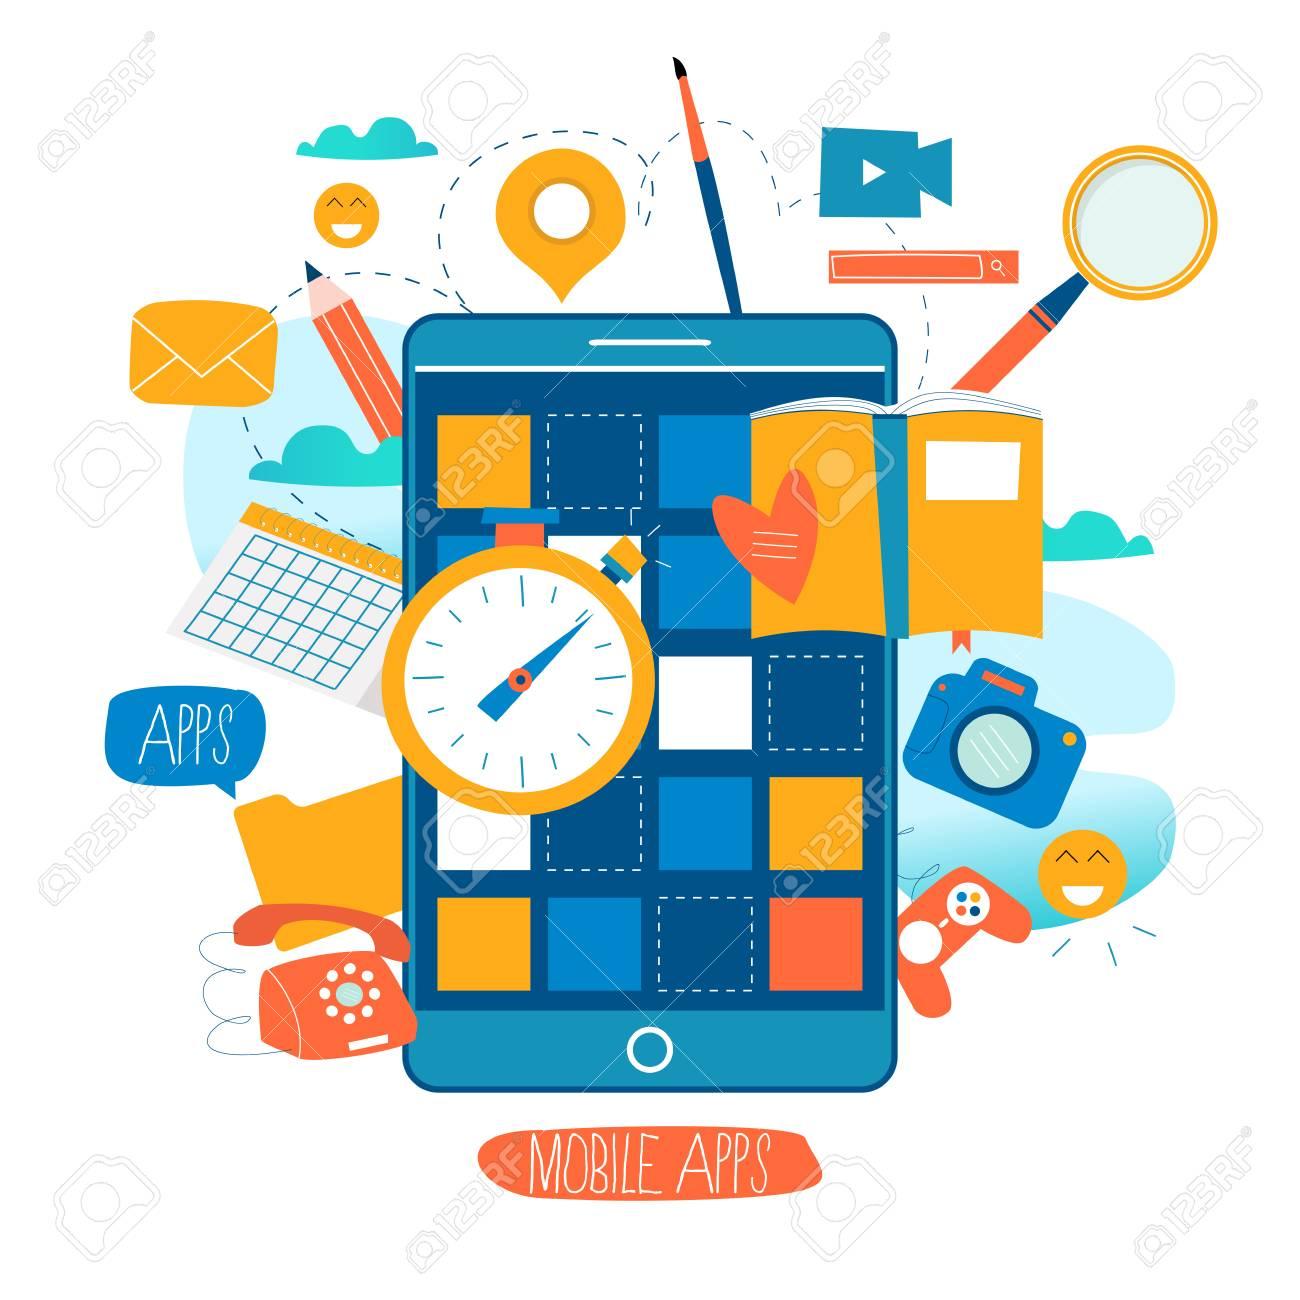 Mobile application development process flat vector illustration